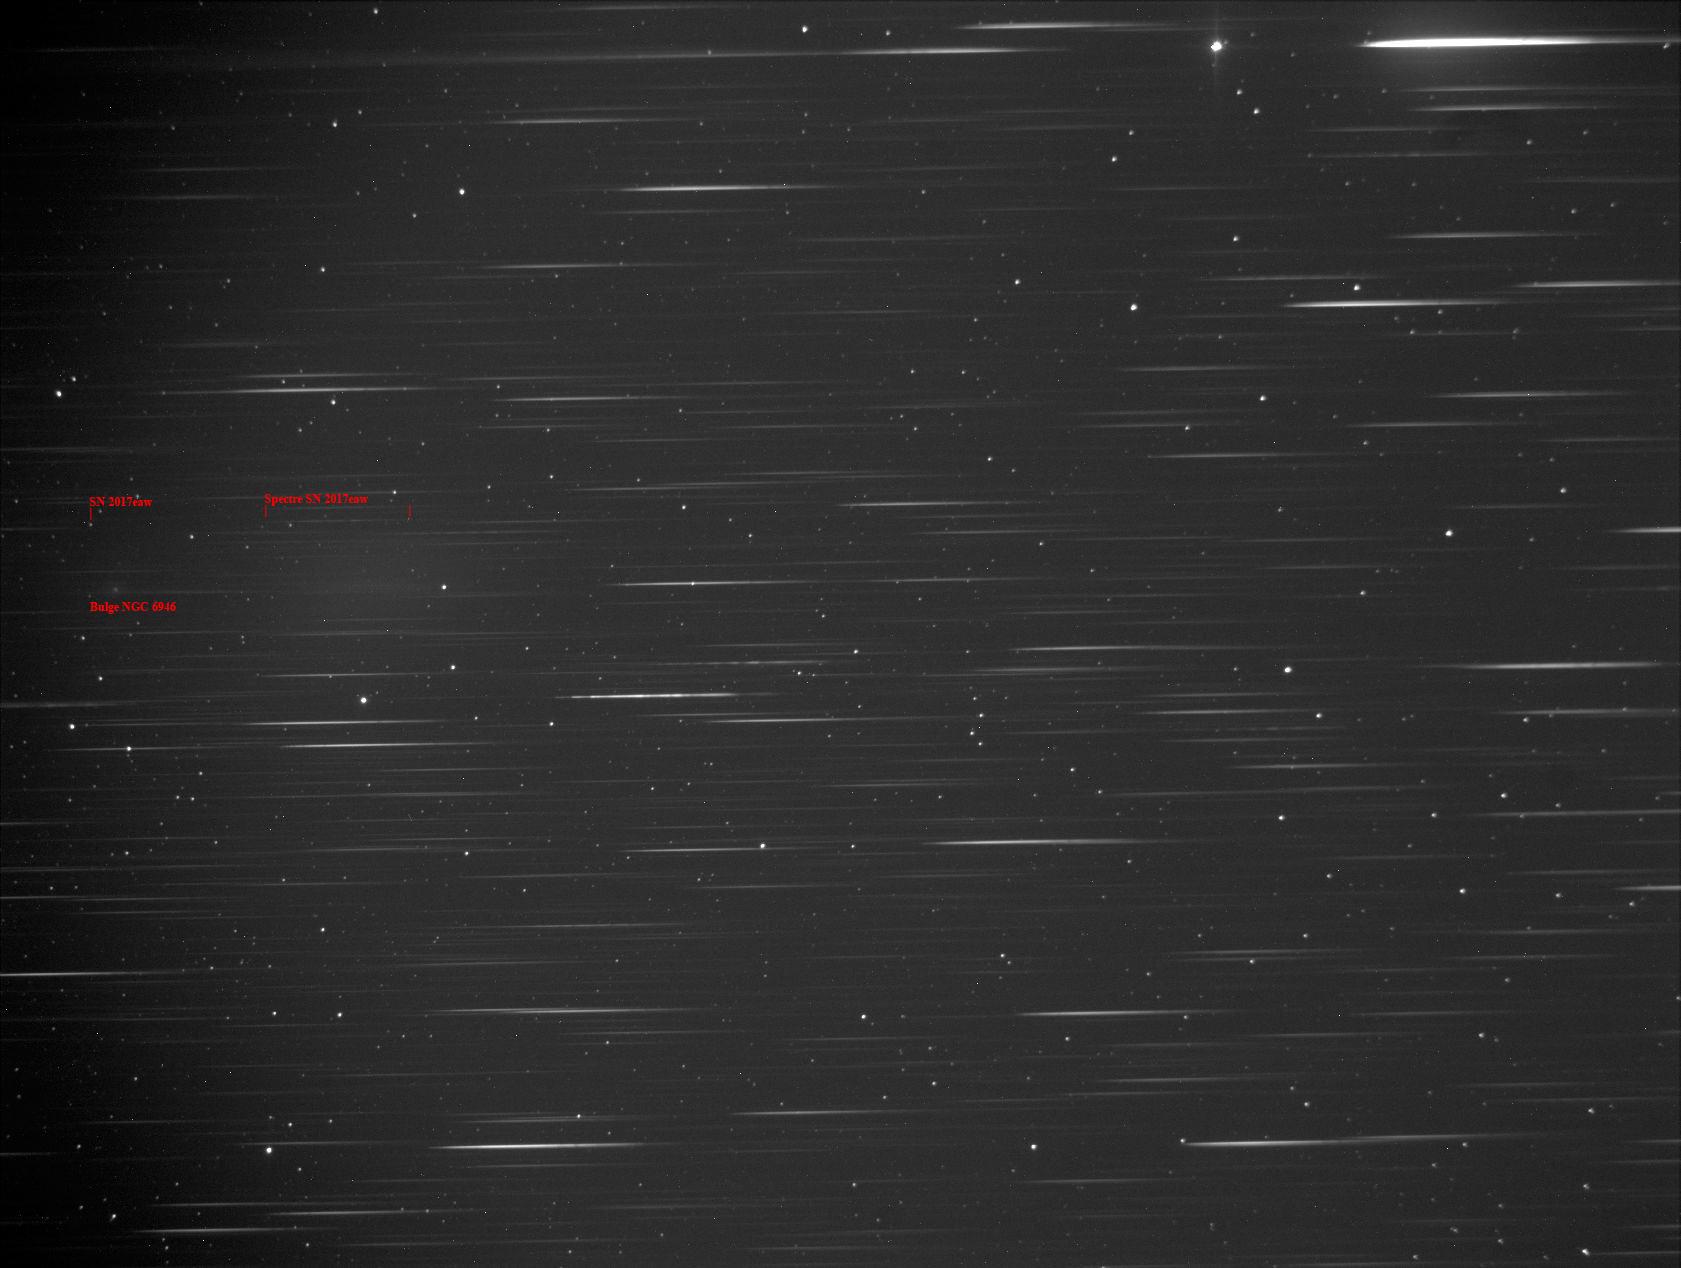 Supernova PSN 2017eaw dans la bien nommée fireworks galaxy (NGC 6946) 9159363734718sn